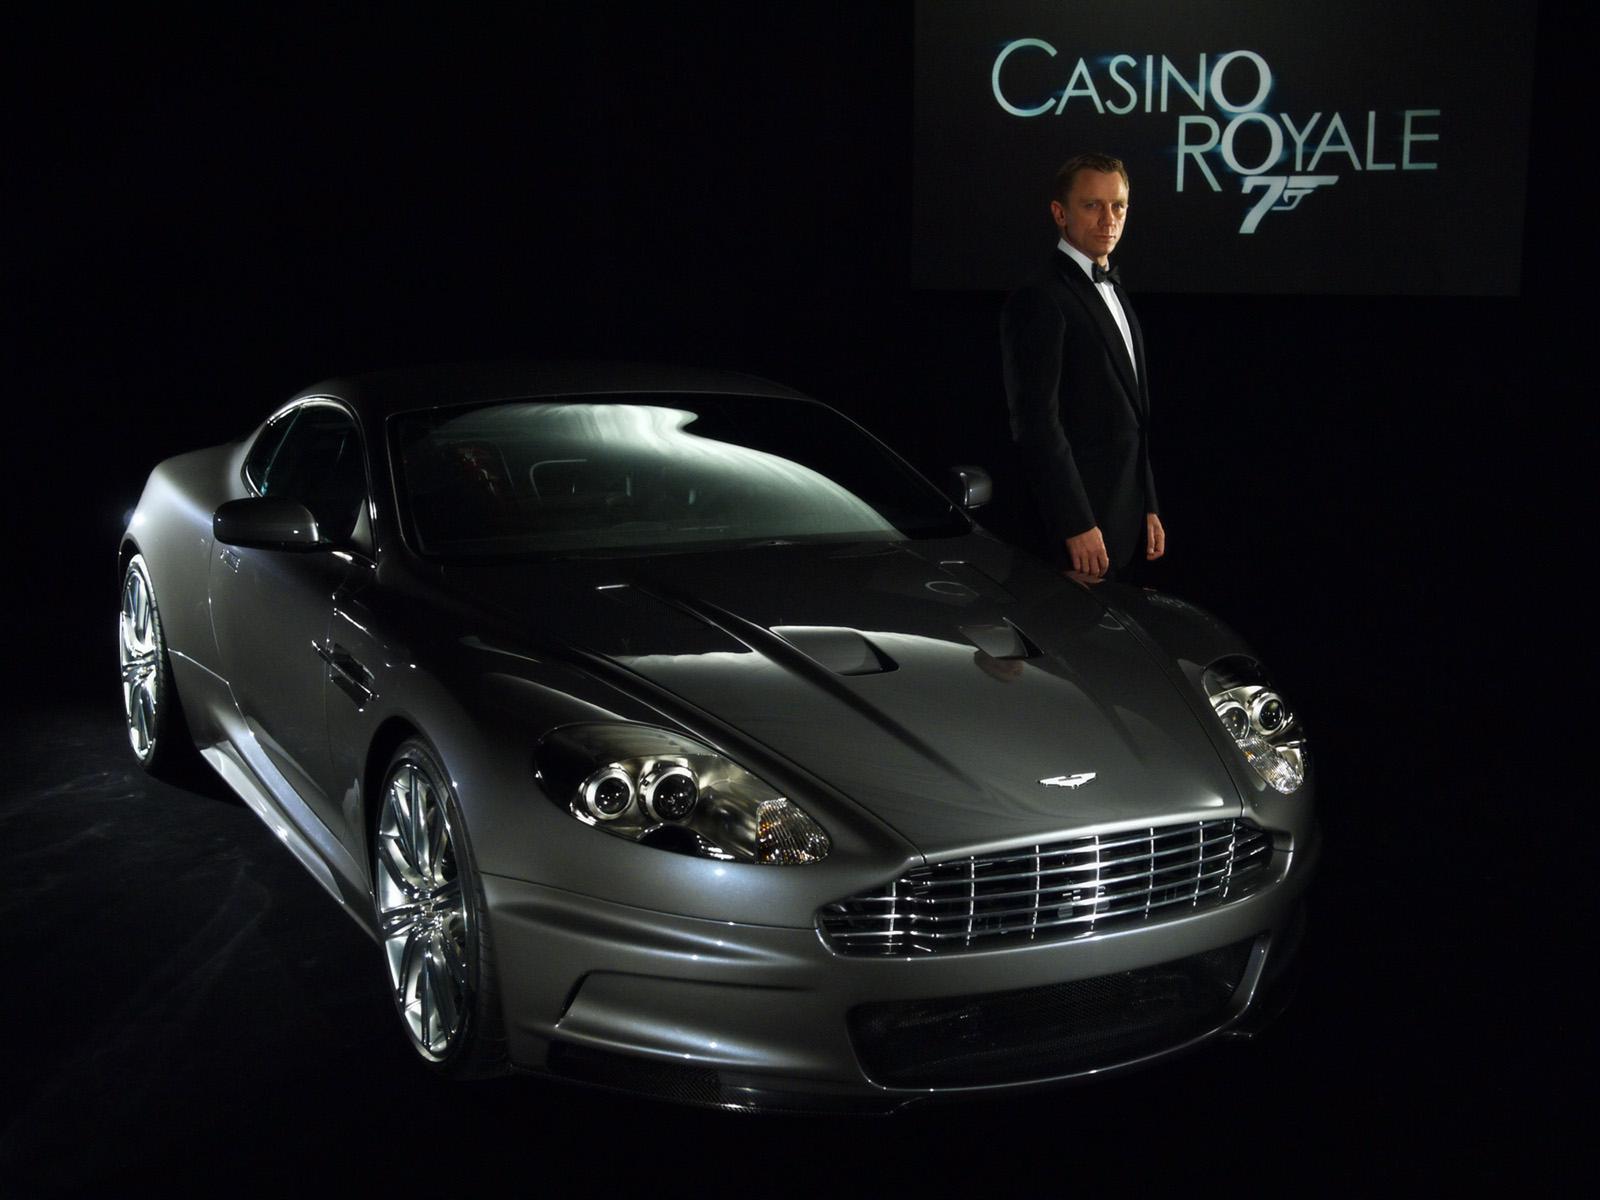 Pic New Posts: Wallpaper 007 James Bond